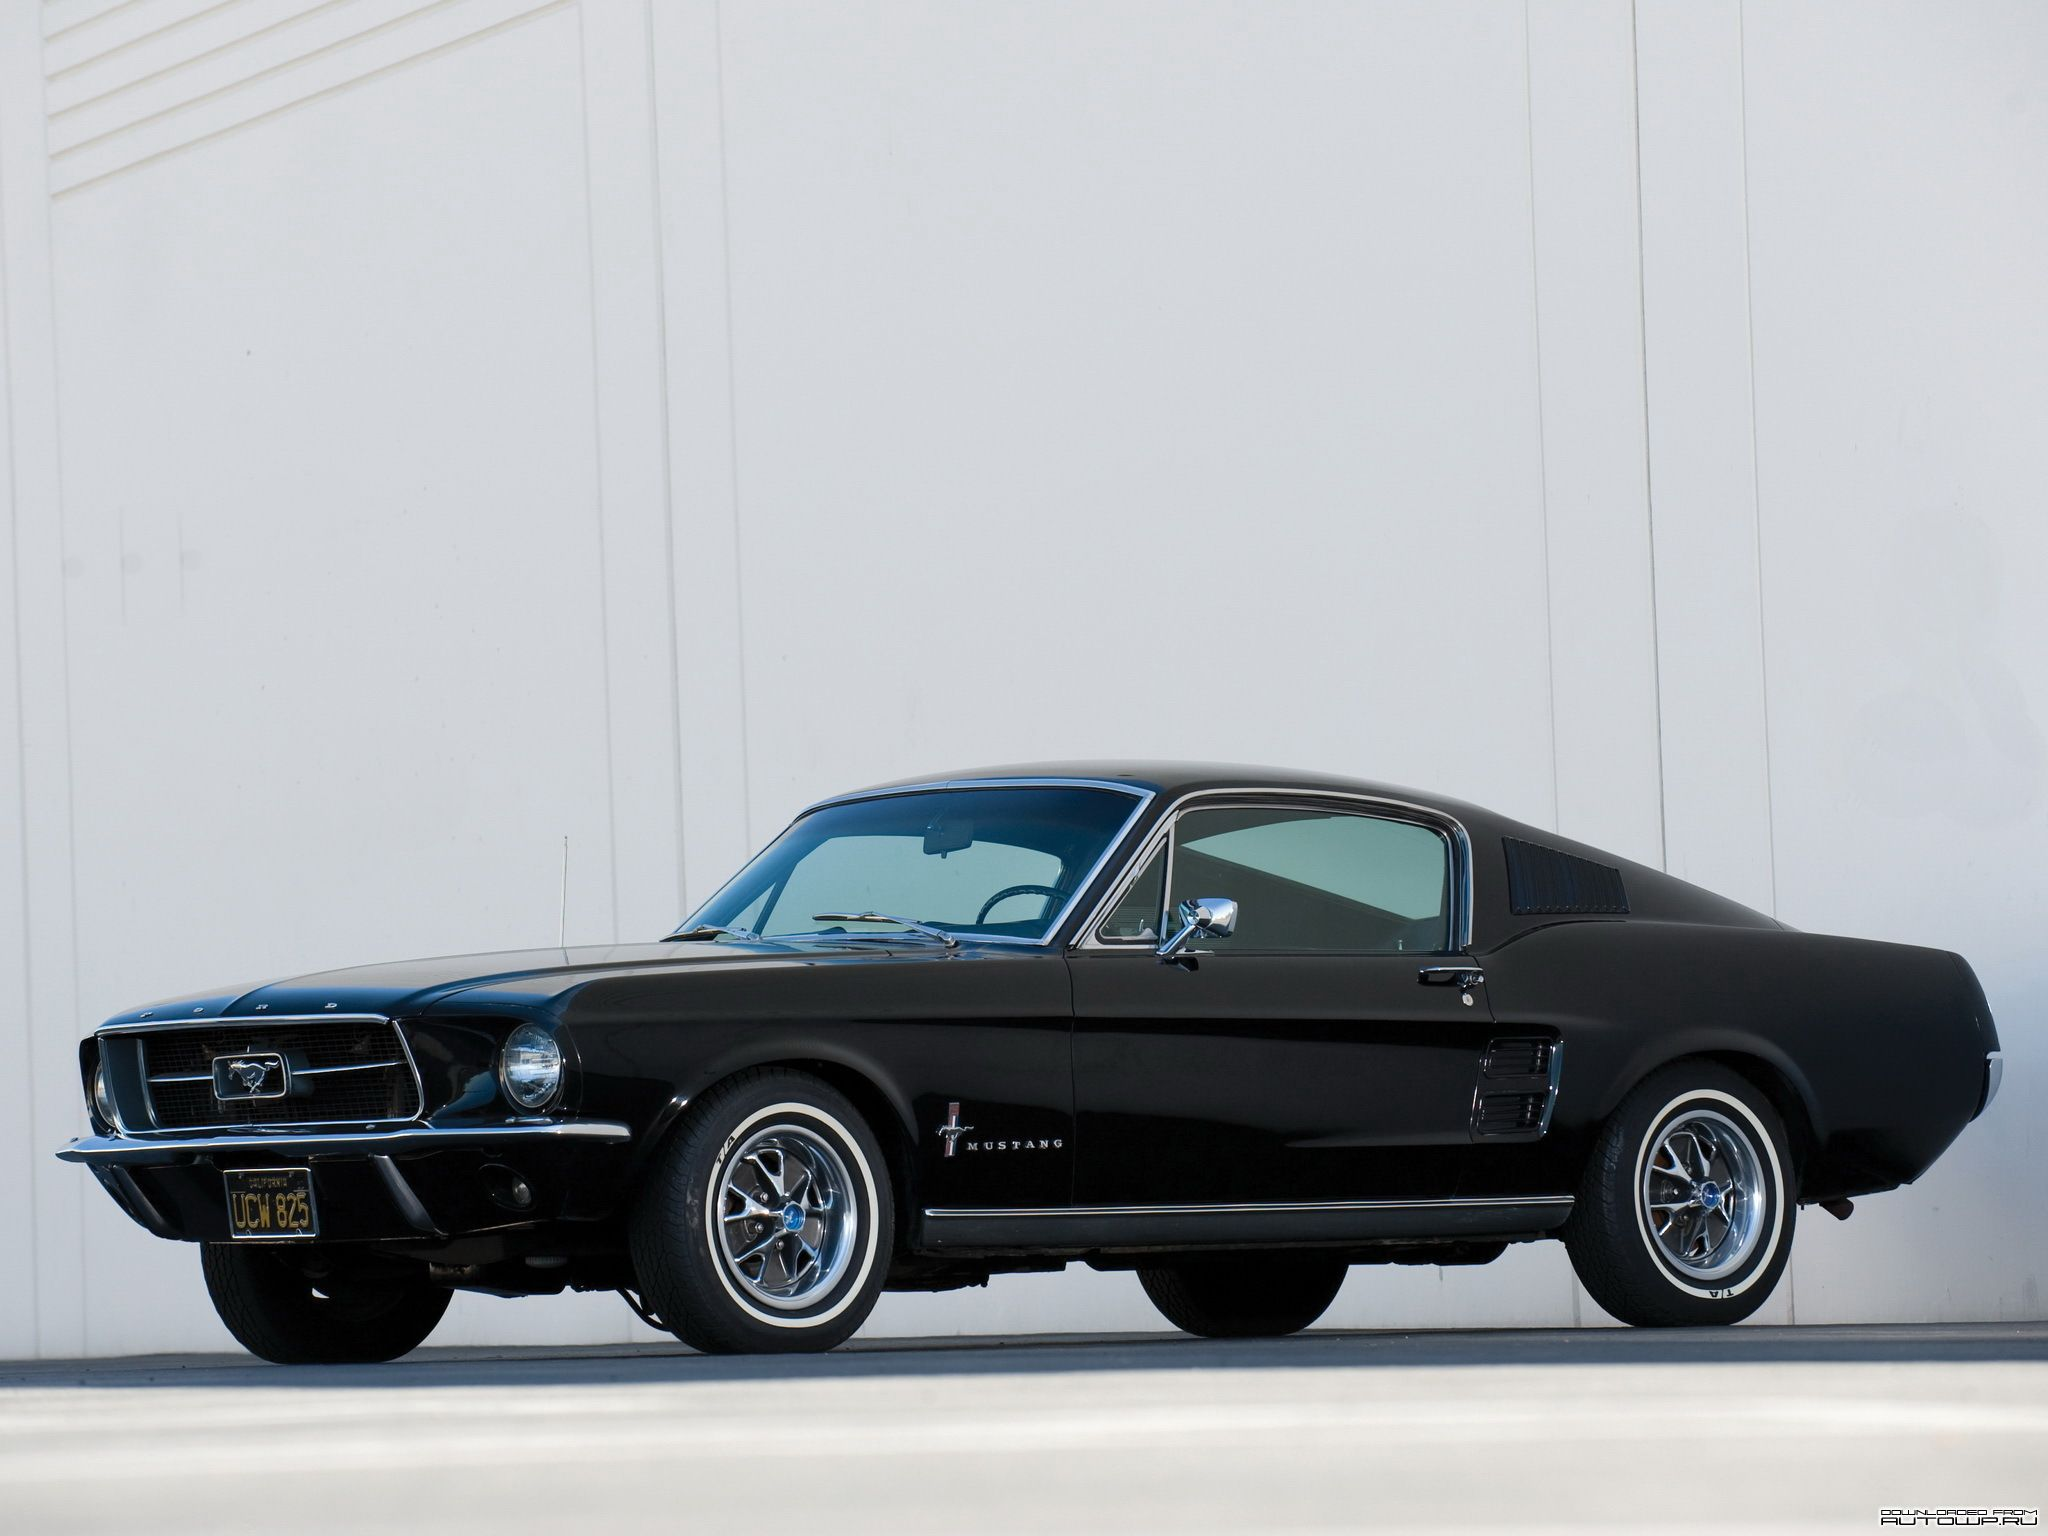 Mustang Fastback 1967 Mustang Fastback Ford Mustang Fastback